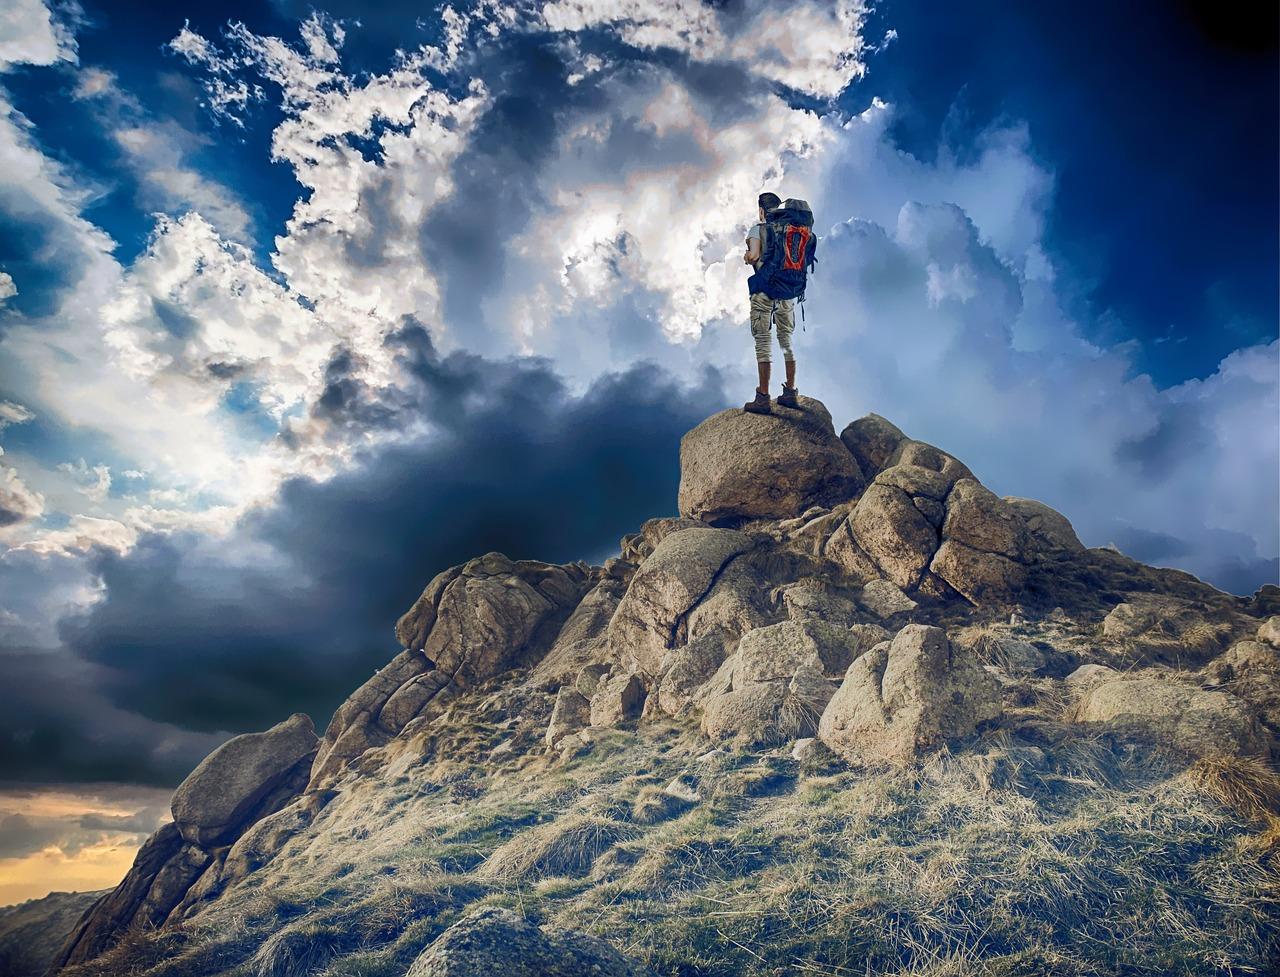 mountaineer-2481635_1280.jpg